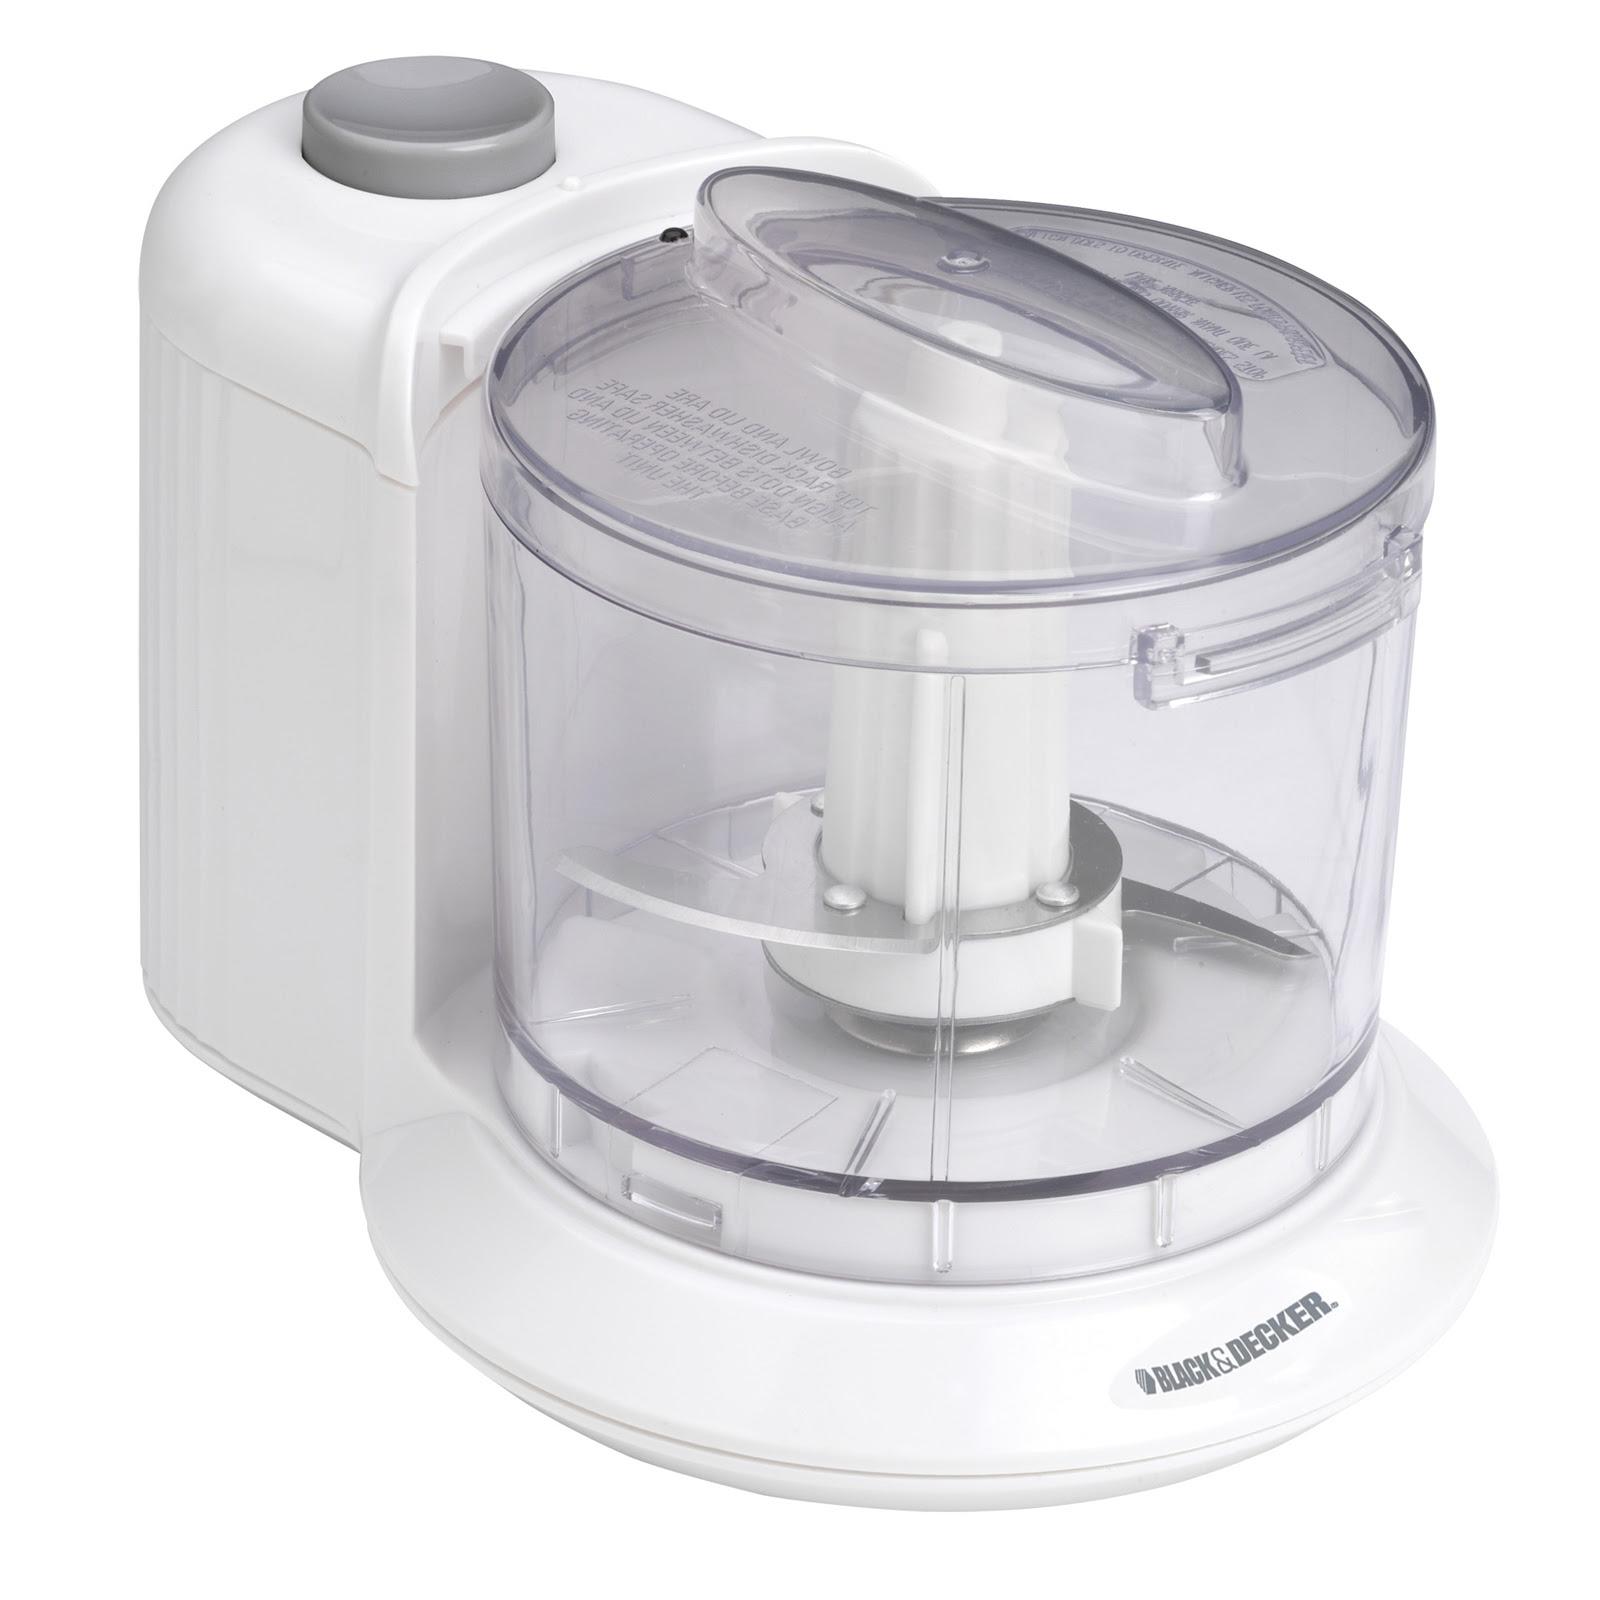 BLACK+DECKER Mini Food Chopper - Appliances - Small ...